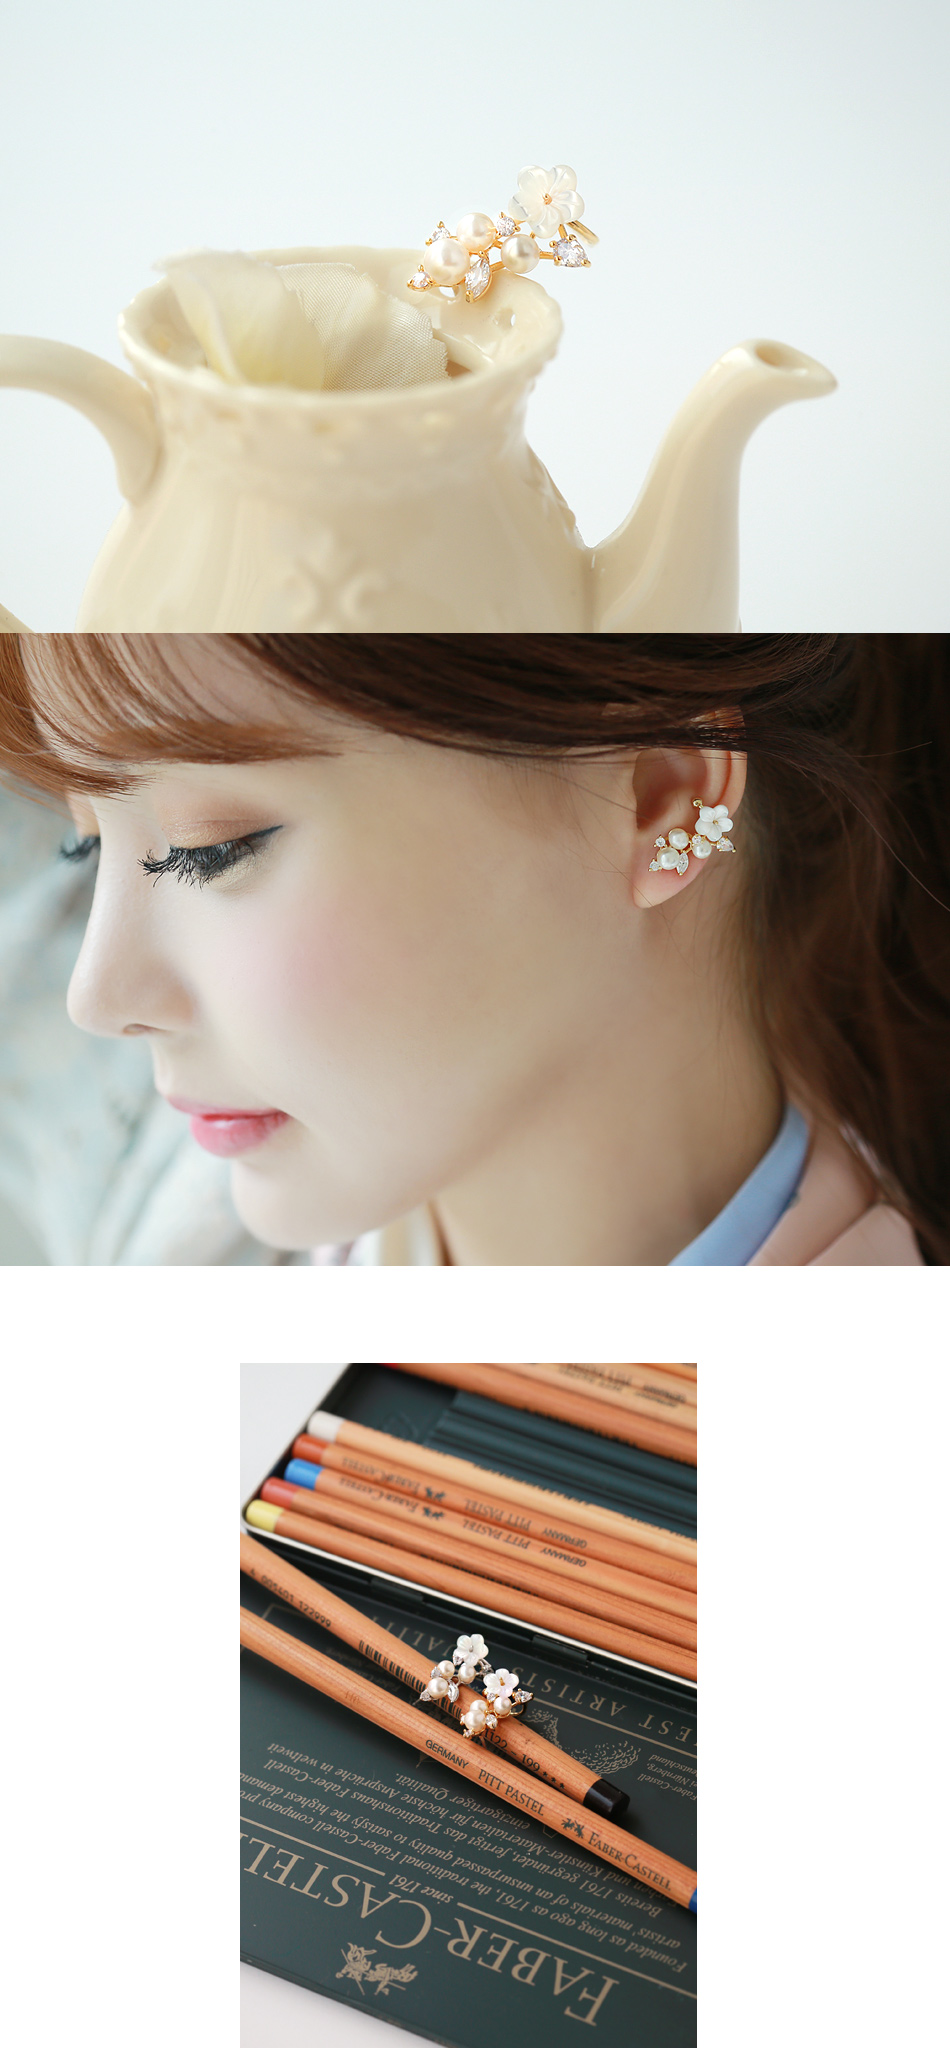 [ 4xtyle ] ·清洁耳朵的袖带,2种颜色